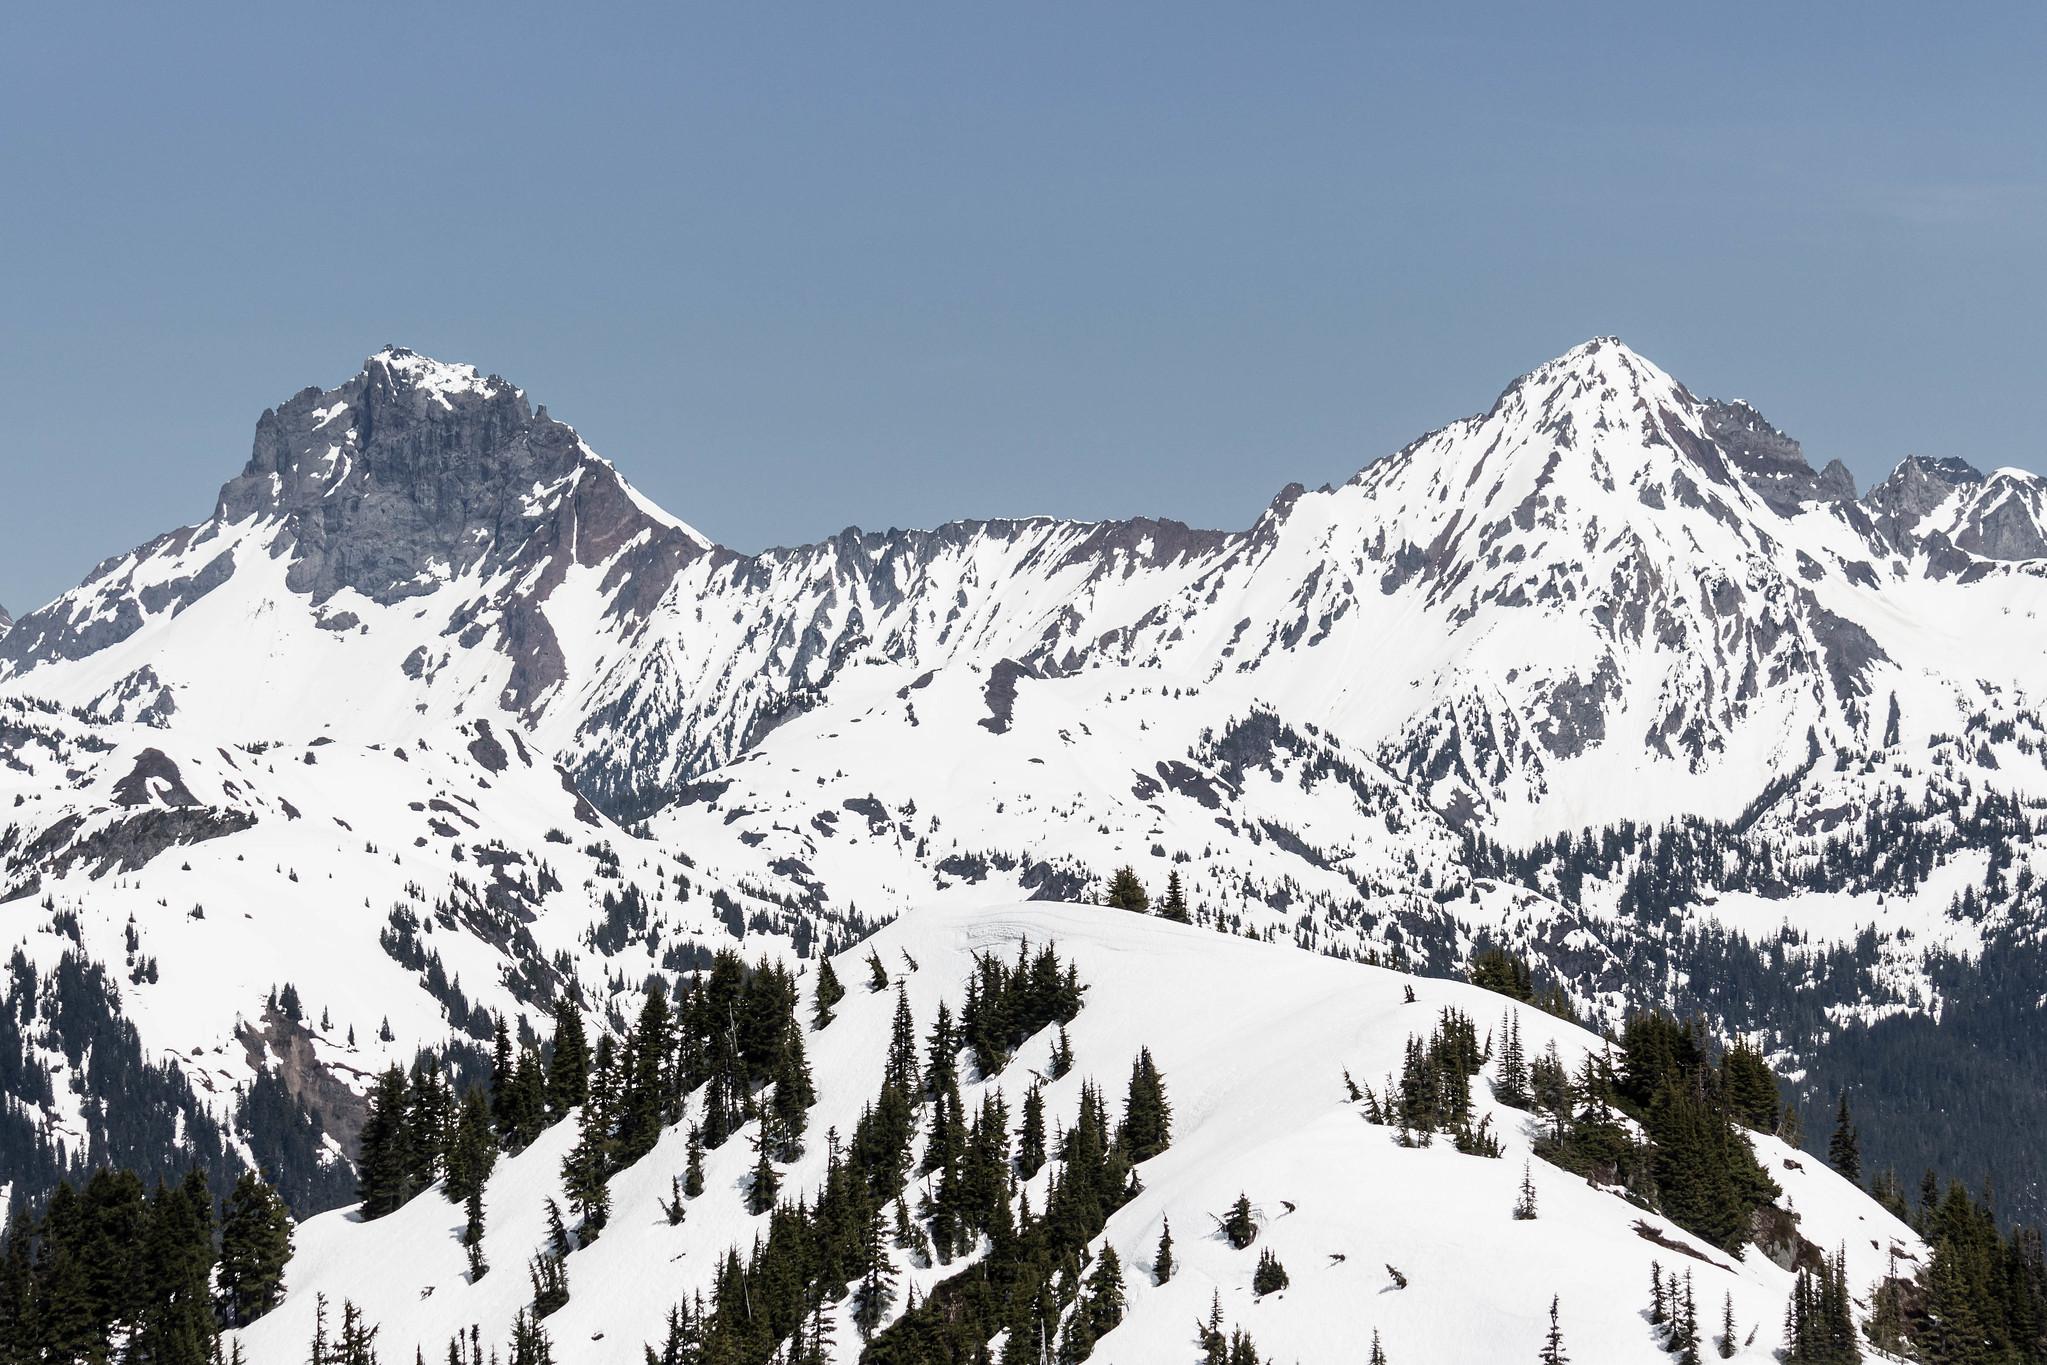 American Border Peak and Mount Larrabee